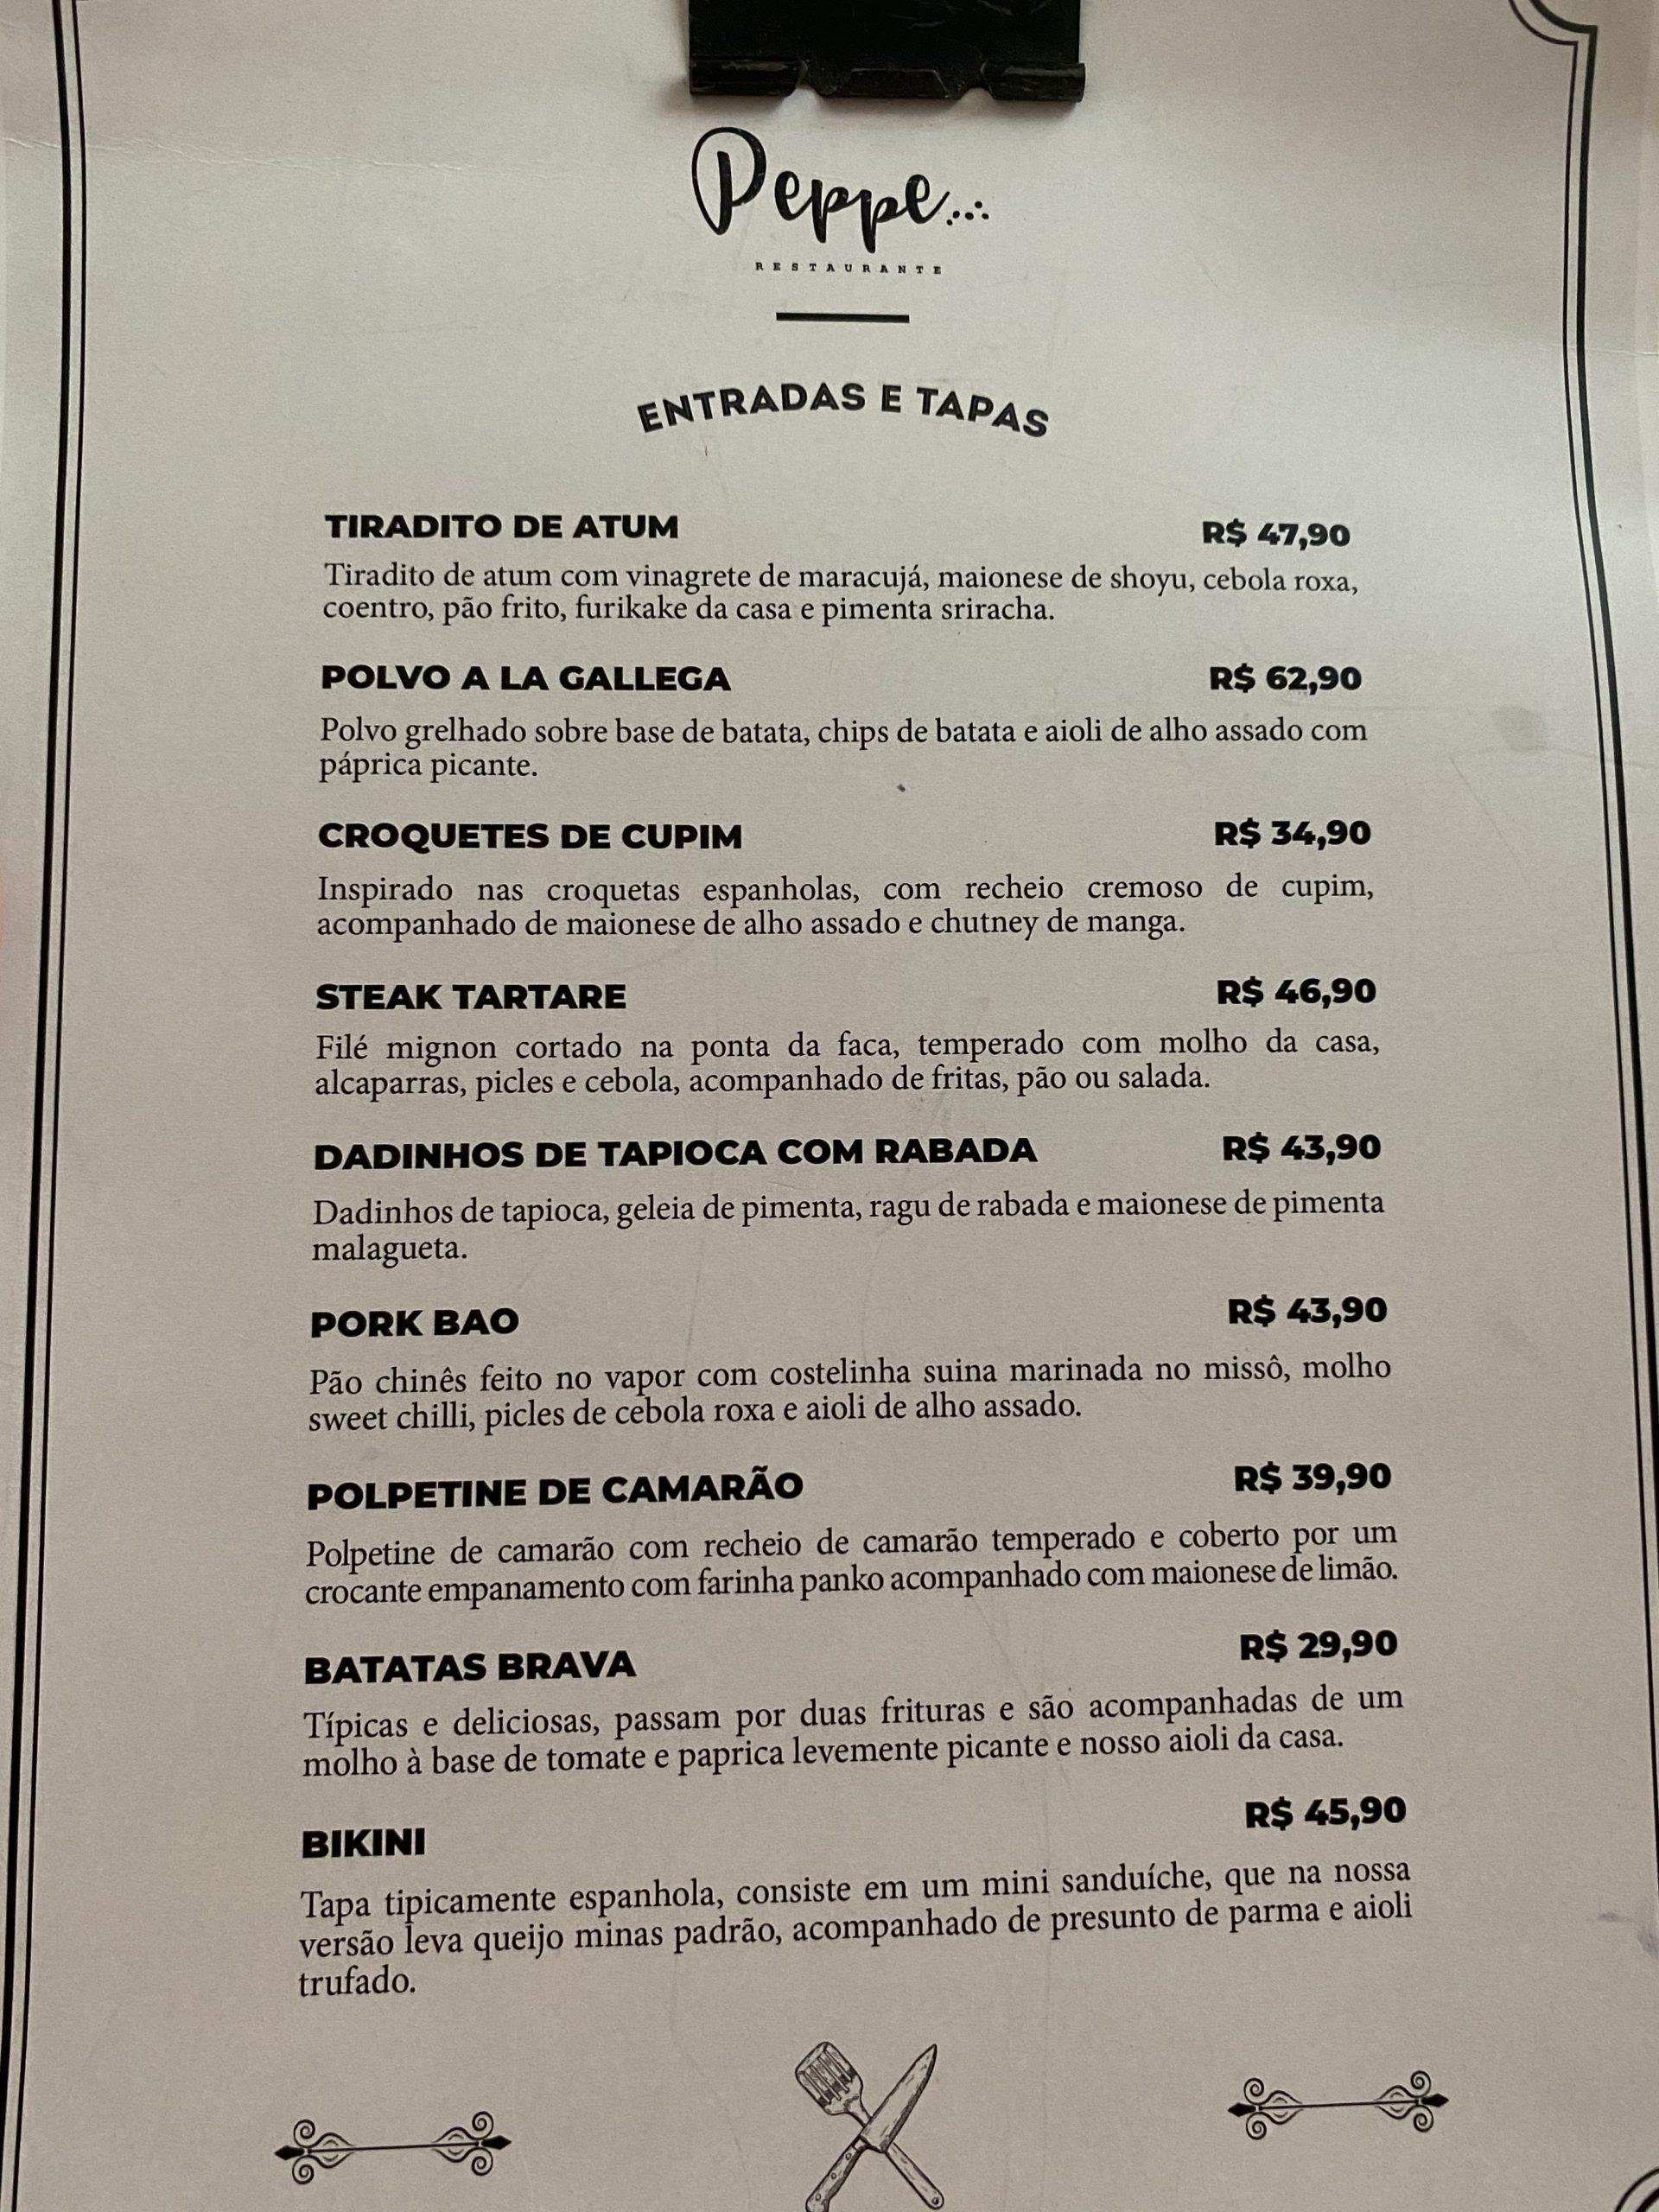 cardápio peppe restaurante 1